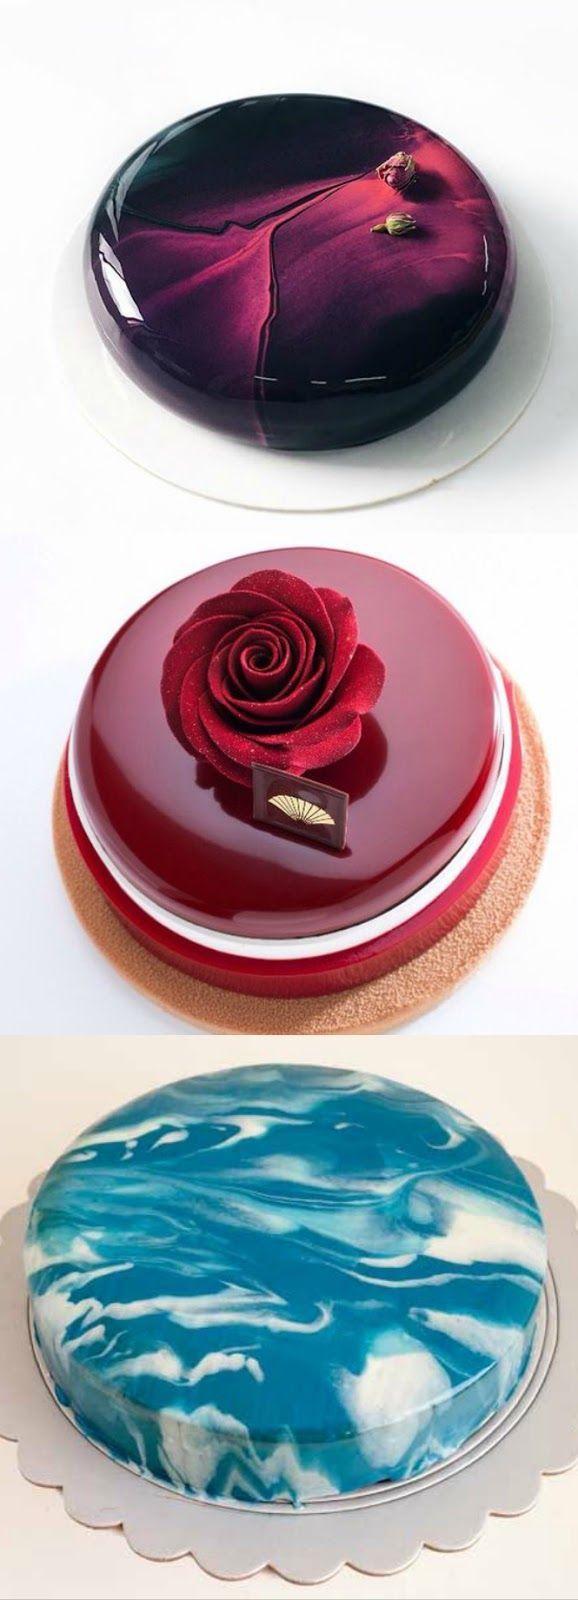 The 25 Best Ideas About Mirror Glaze Cake On Pinterest